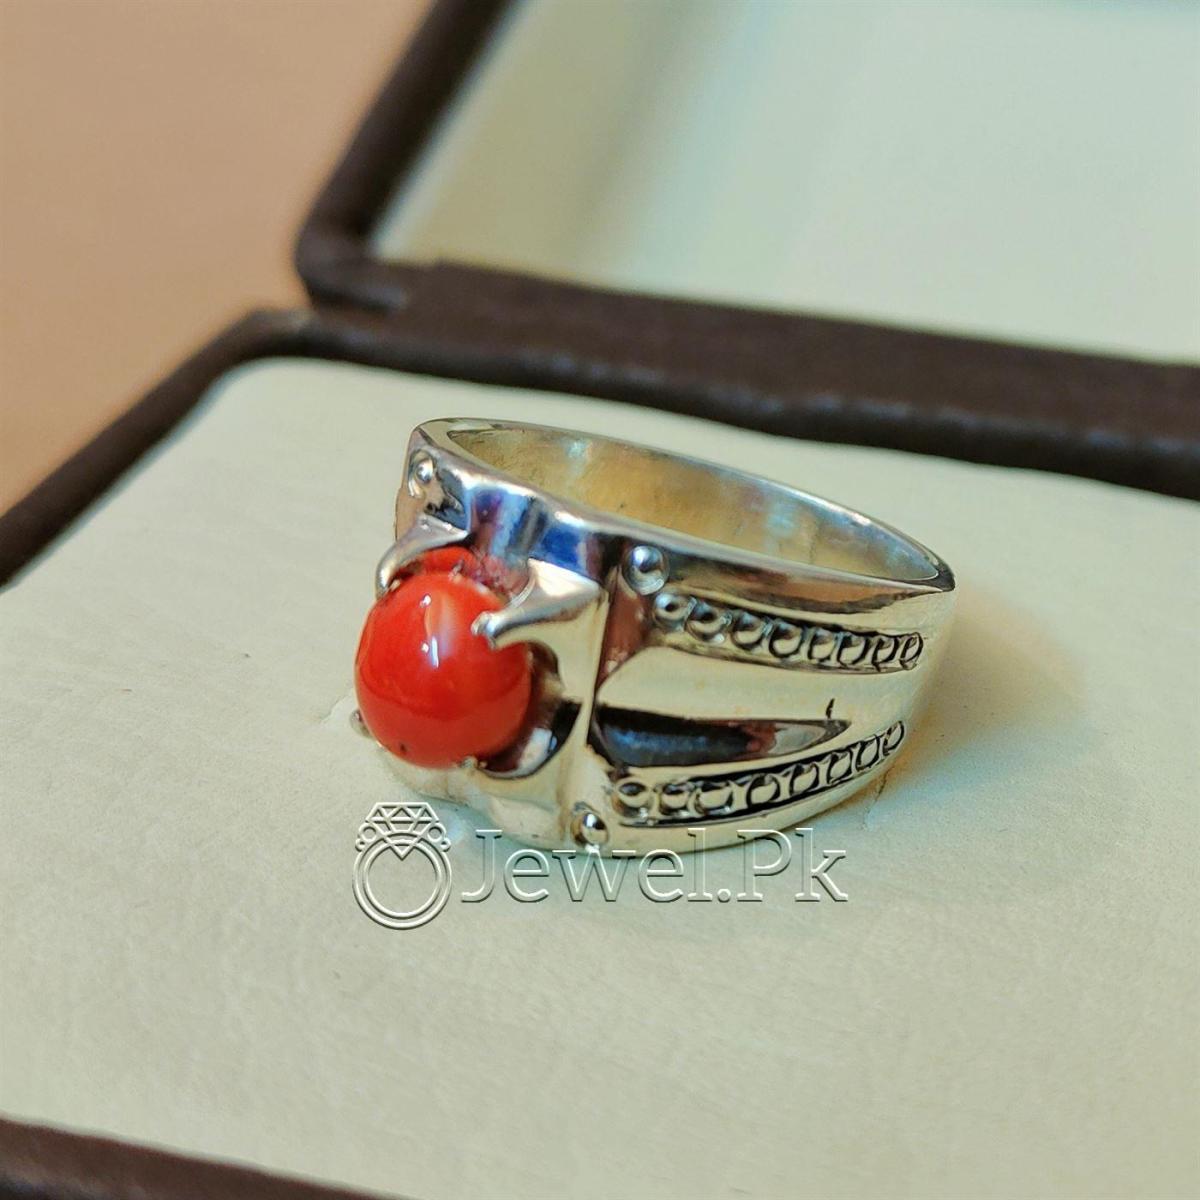 Natural Coral Marjan Ring Handmade 925 Silver Marjan stone 5 natural gemstones pakistan + 925 silver jewelry online